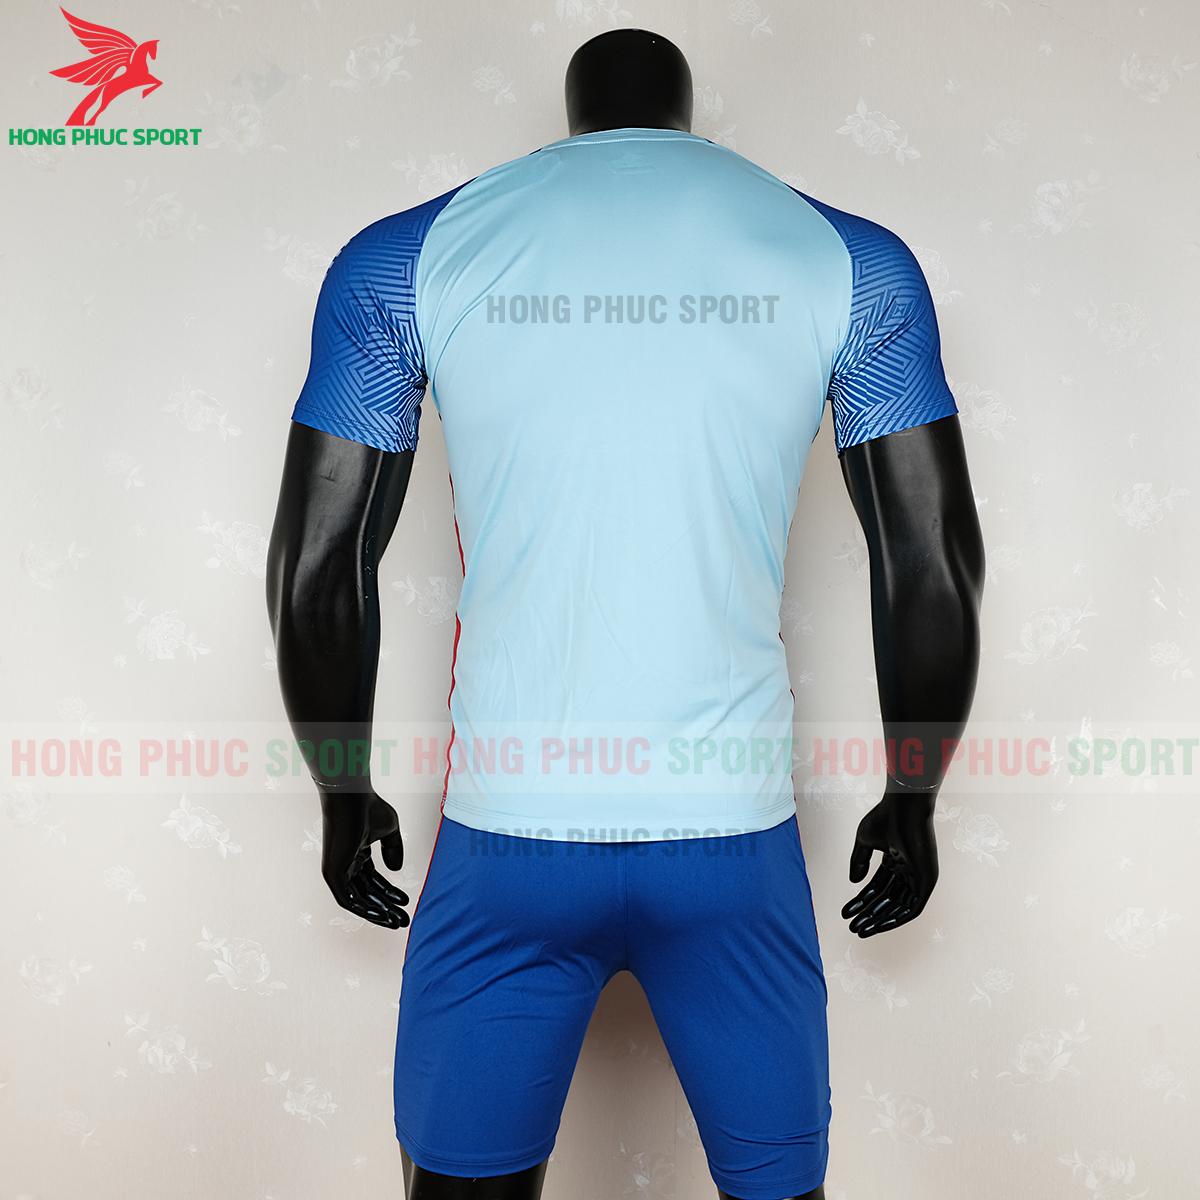 https://cdn.hongphucsport.com/unsafe/s4.shopbay.vn/files/285/ao-bong-da-riki-quator-xanh-nhat-7-5f71b393a345d.png